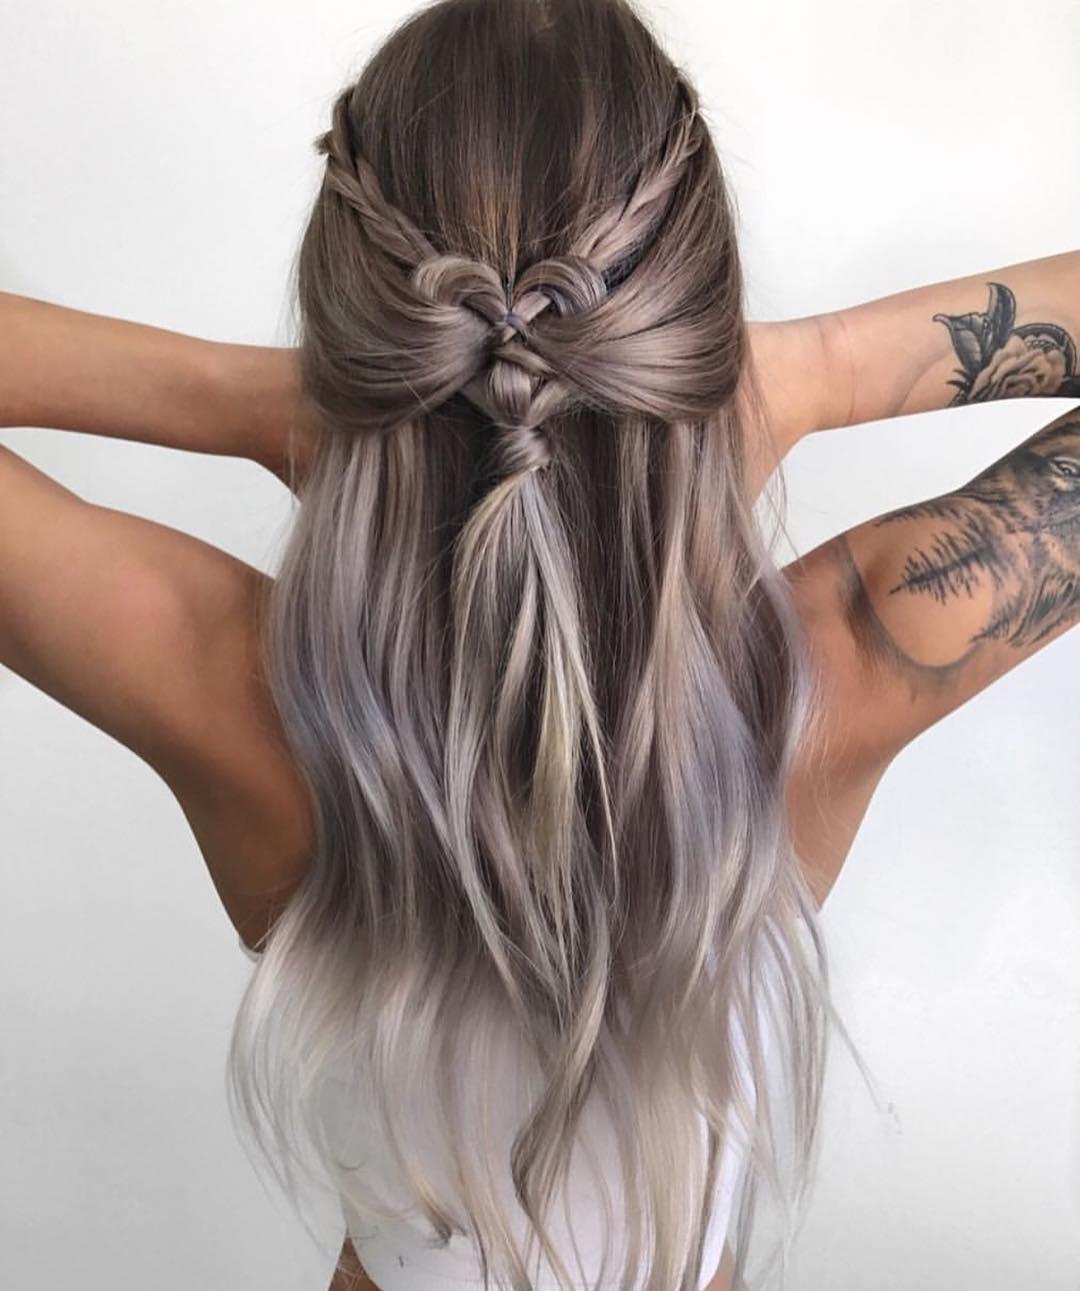 10 Braided Hairstyles for Long Hair  Weddings Festivals  Holiday Hair Ideas  PoPular Haircuts